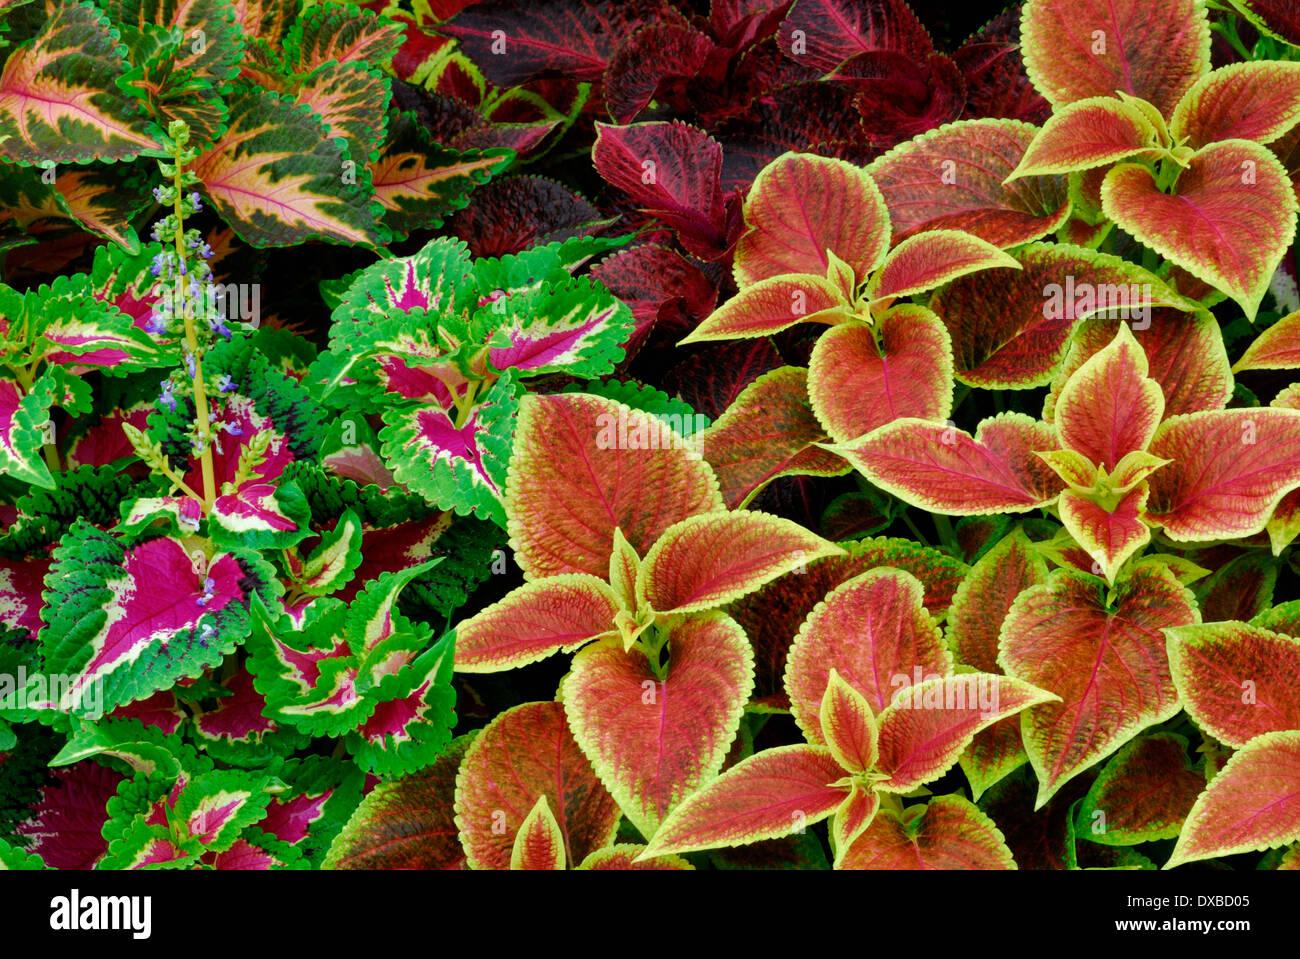 Solenostemon scutellarioides Stock Photo